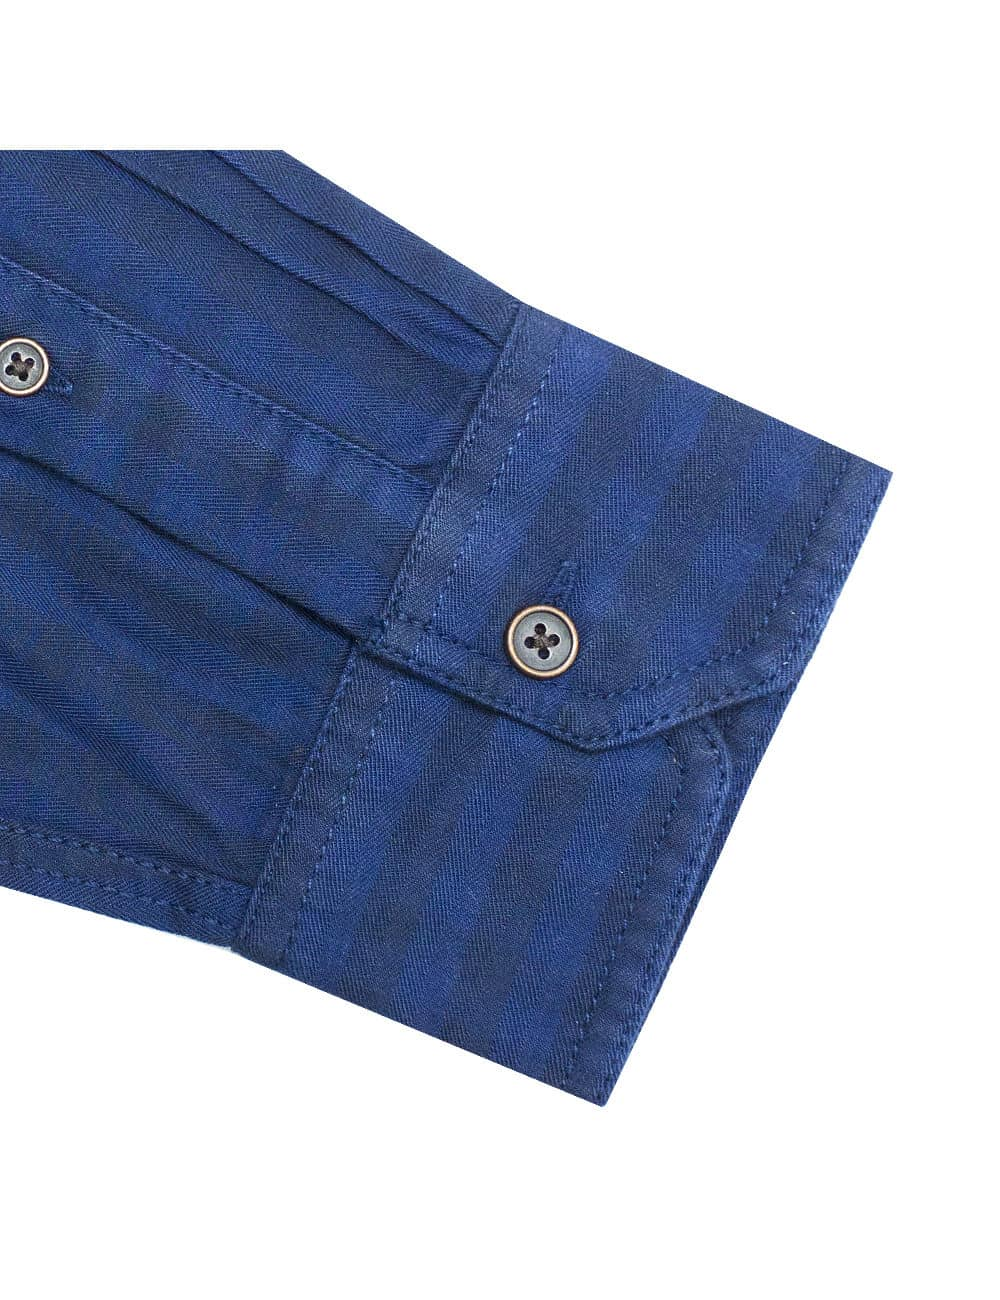 RF Navy Checks Denim Collection 100% Cotton Long Sleeve Single Cuff Shirt RF35A1.8